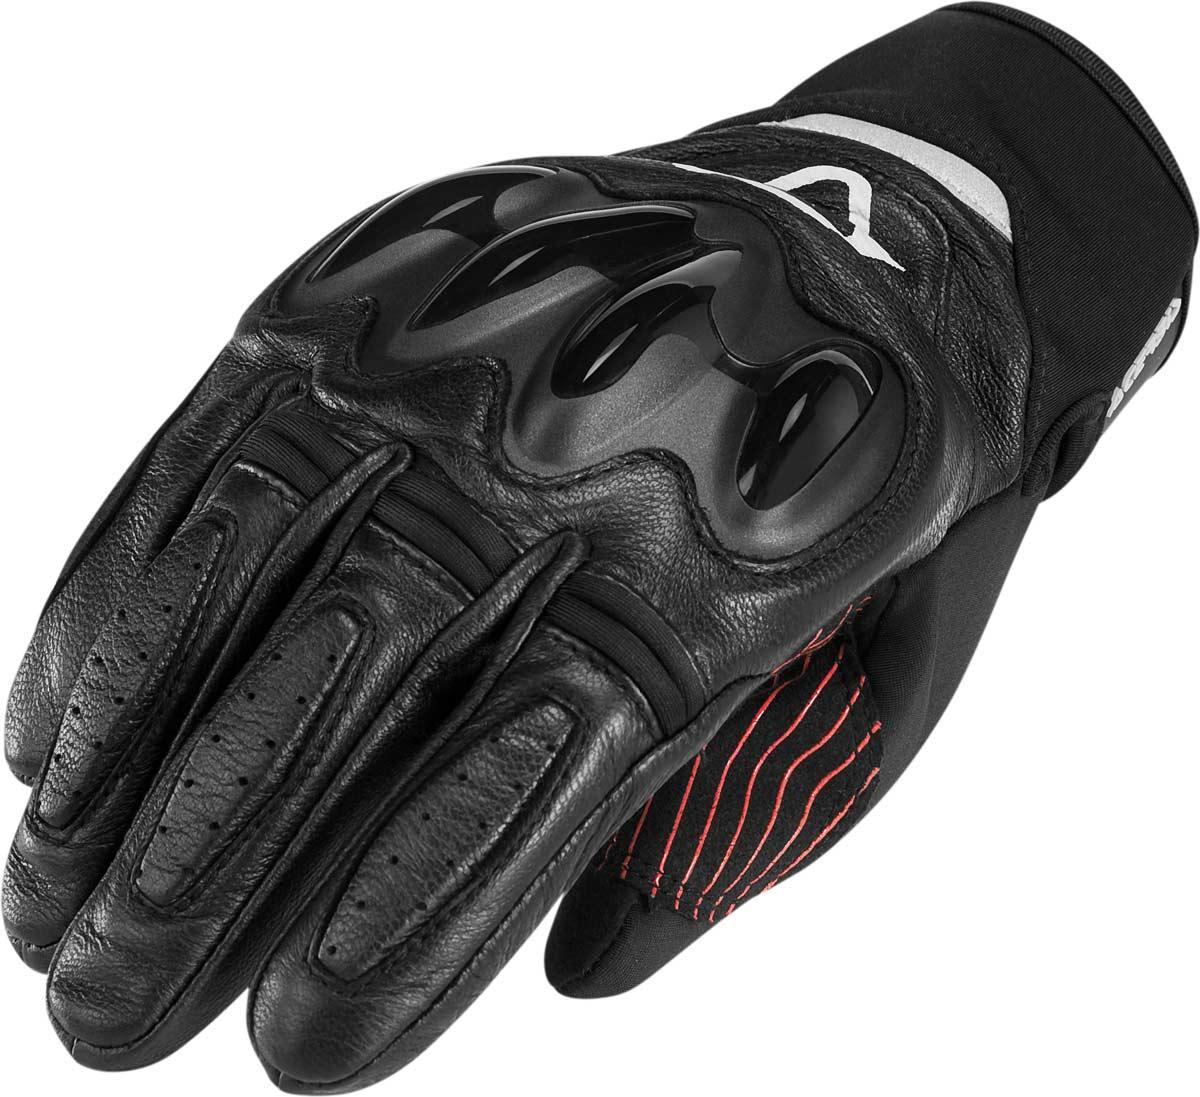 gants-moto-acerbis-arbory-2015-1.jpg